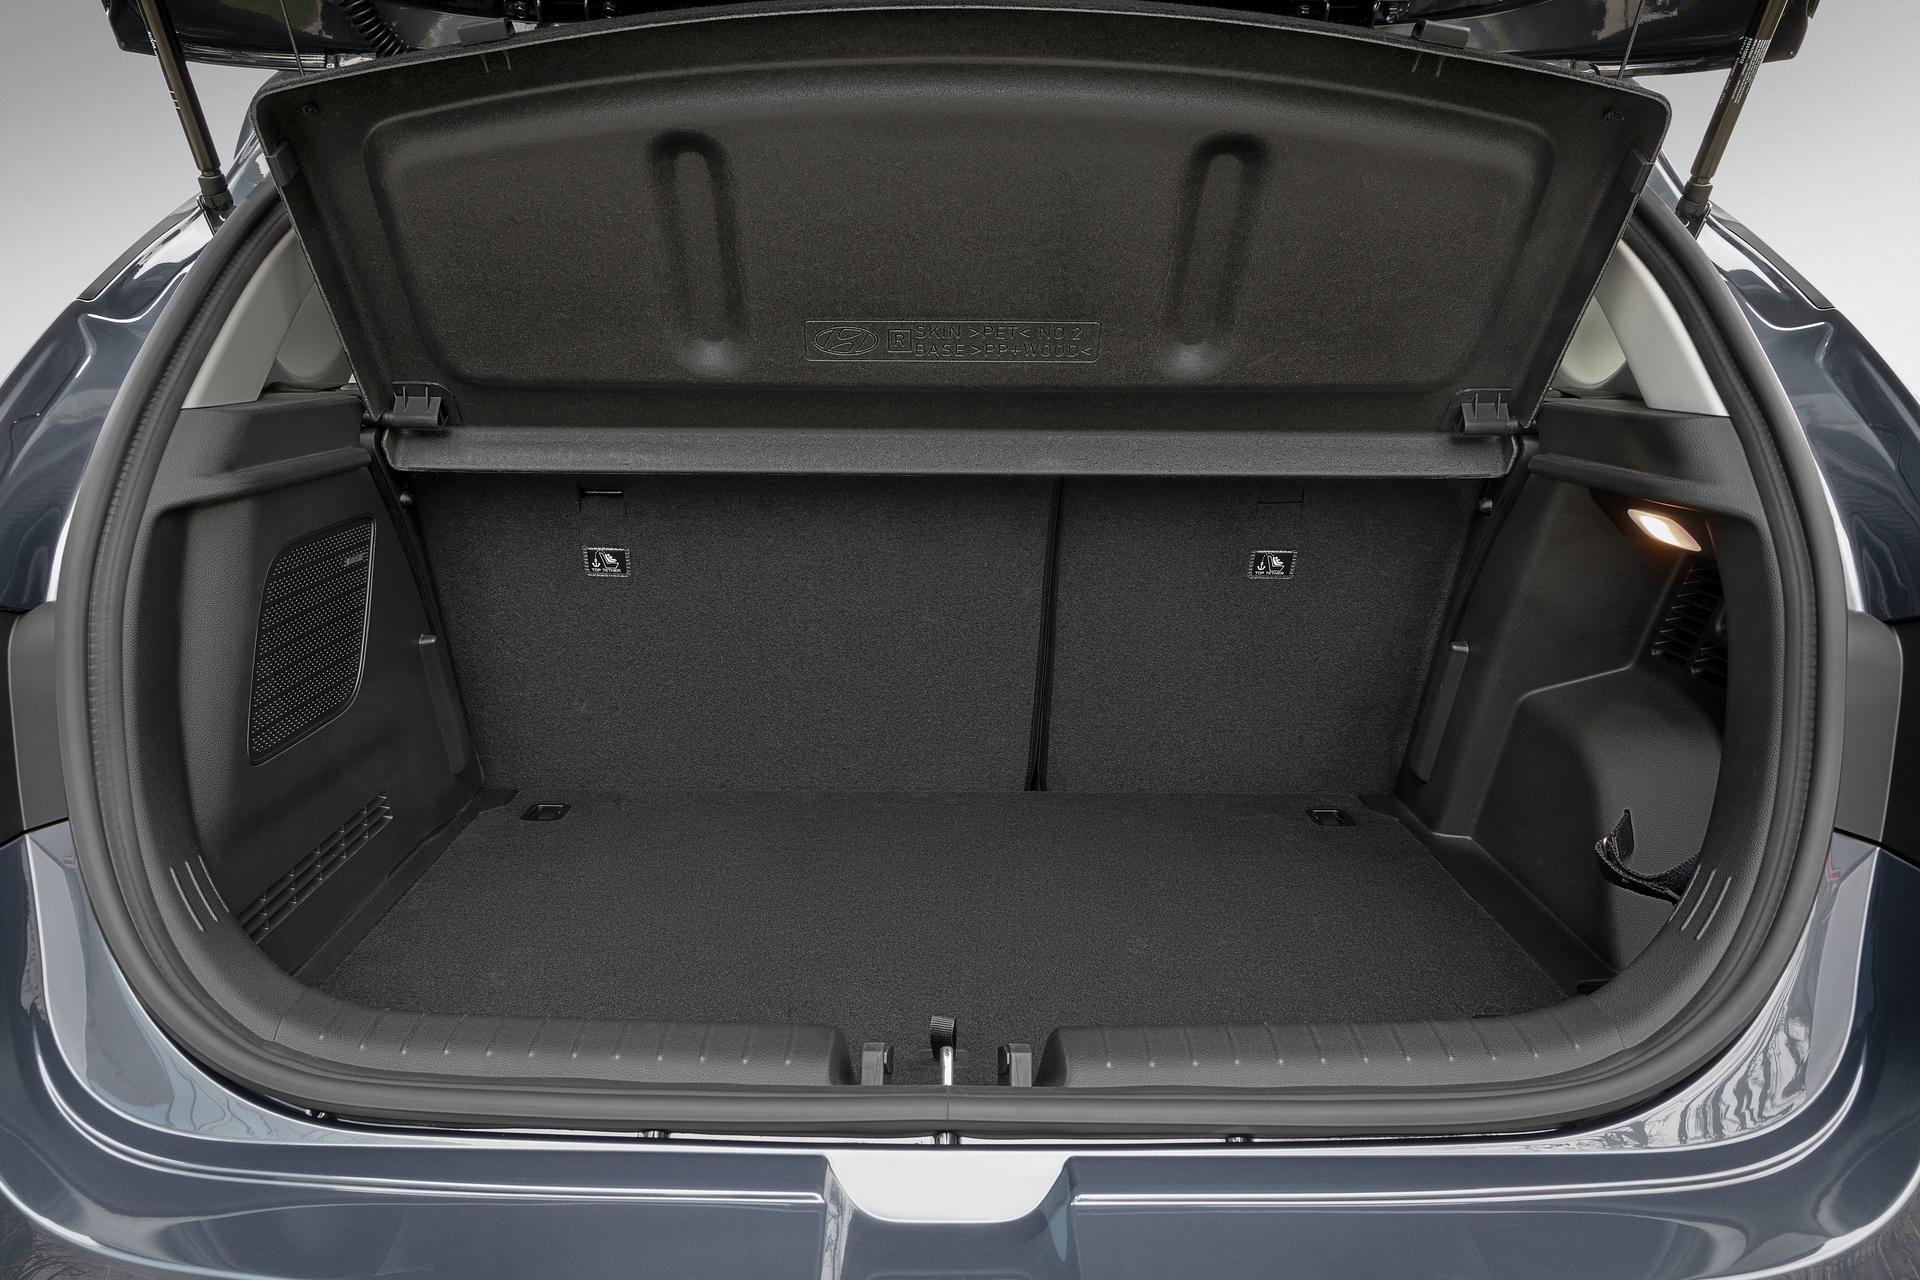 Hyundai_i20_interior_0007